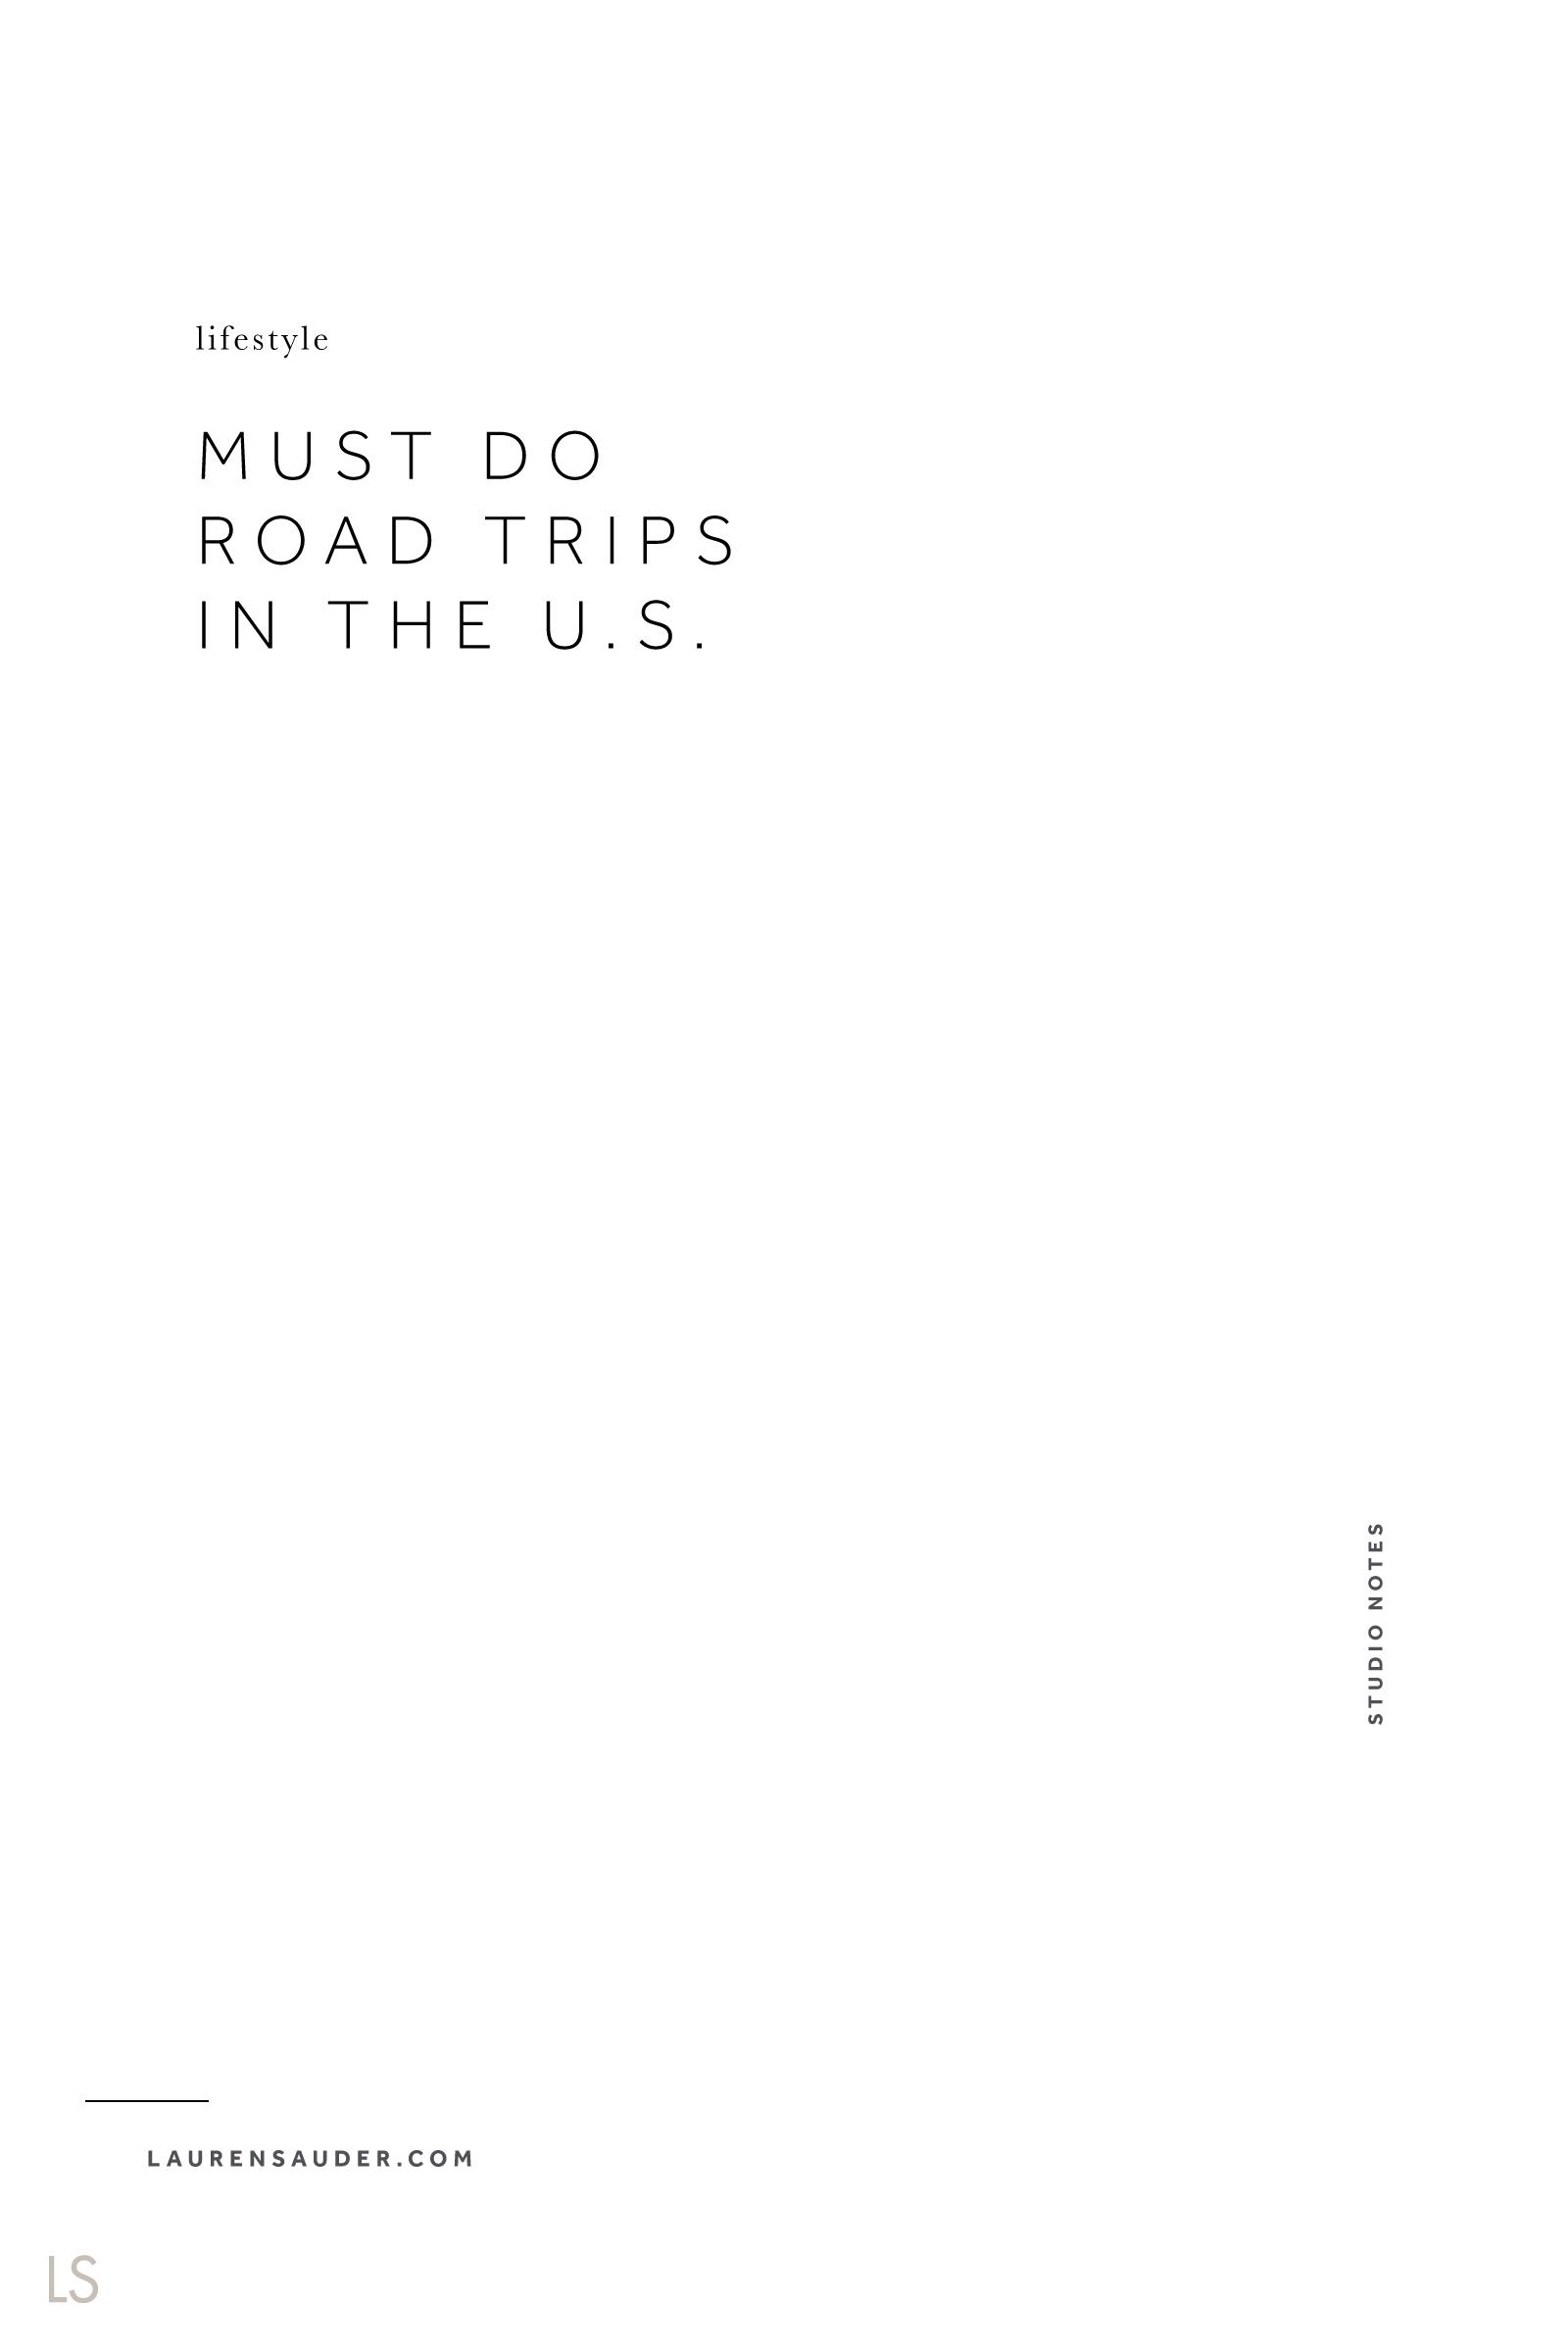 Must Do Road Trips in the US - Lauren Sauder #roadtrips #vacation #travel #wanderlust roads trips in the US, US road trip planner, best road trip ideas, best scenic road trip ideas in USA